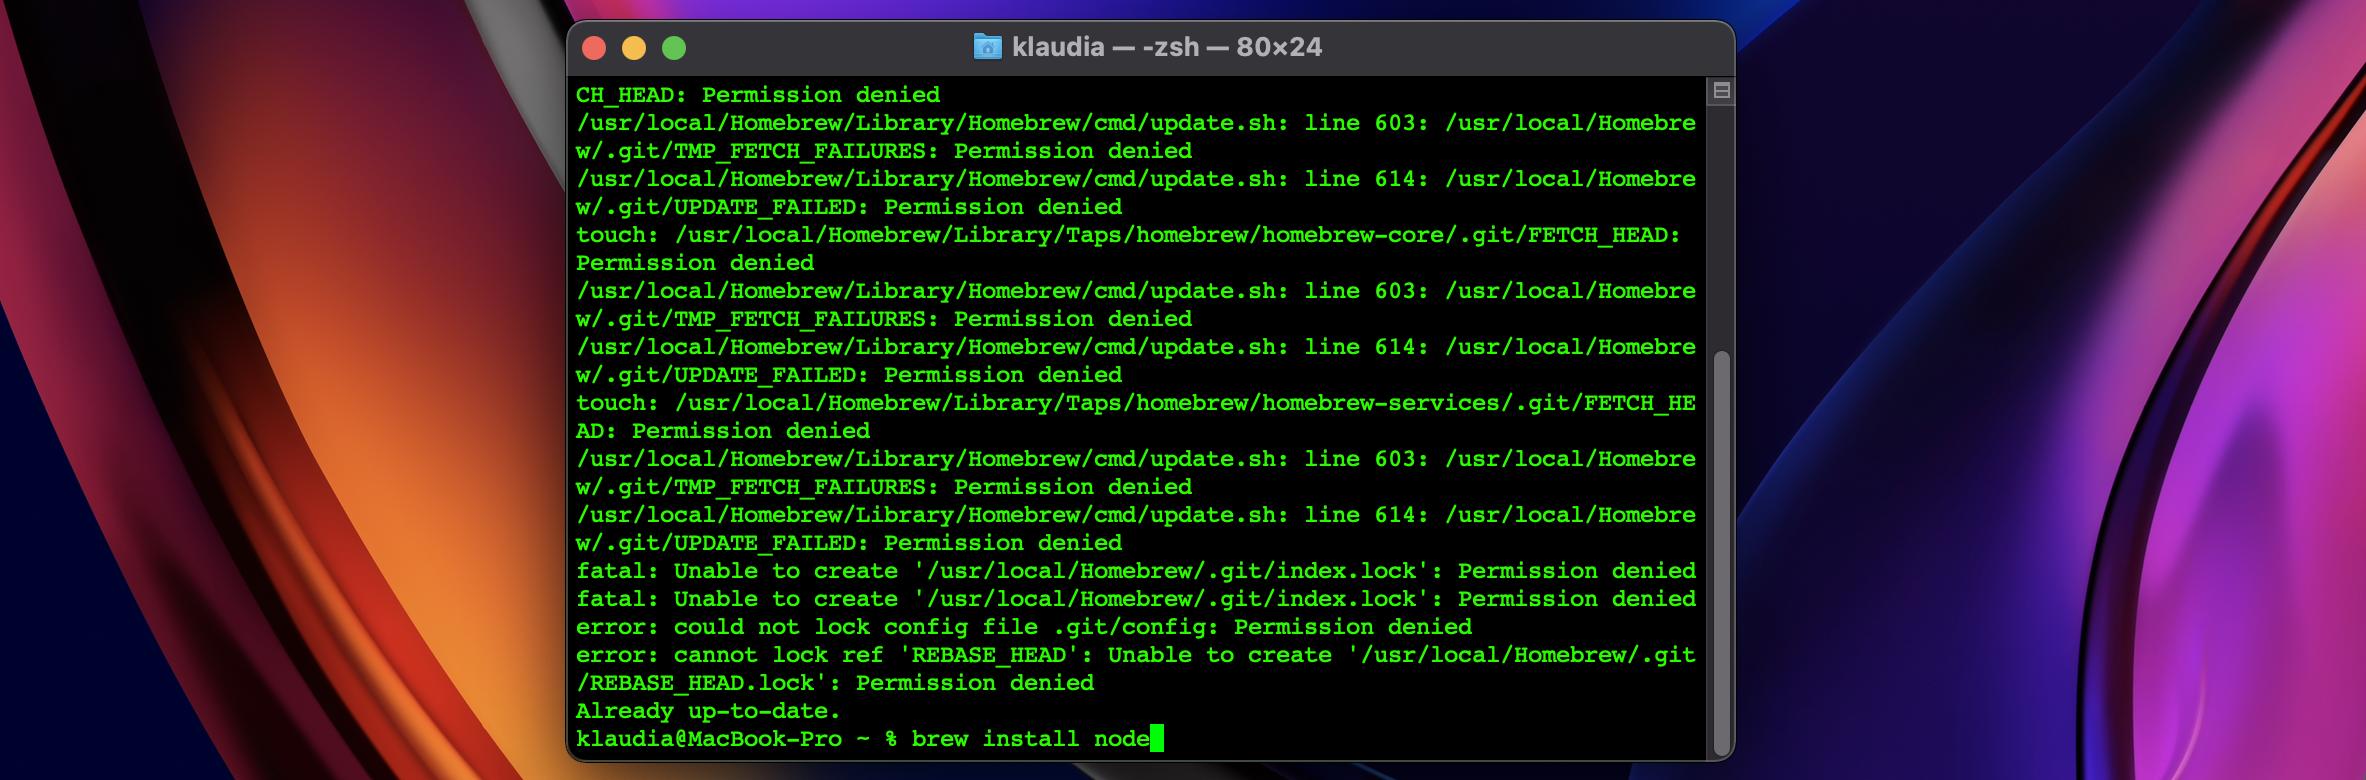 brew install node command entered